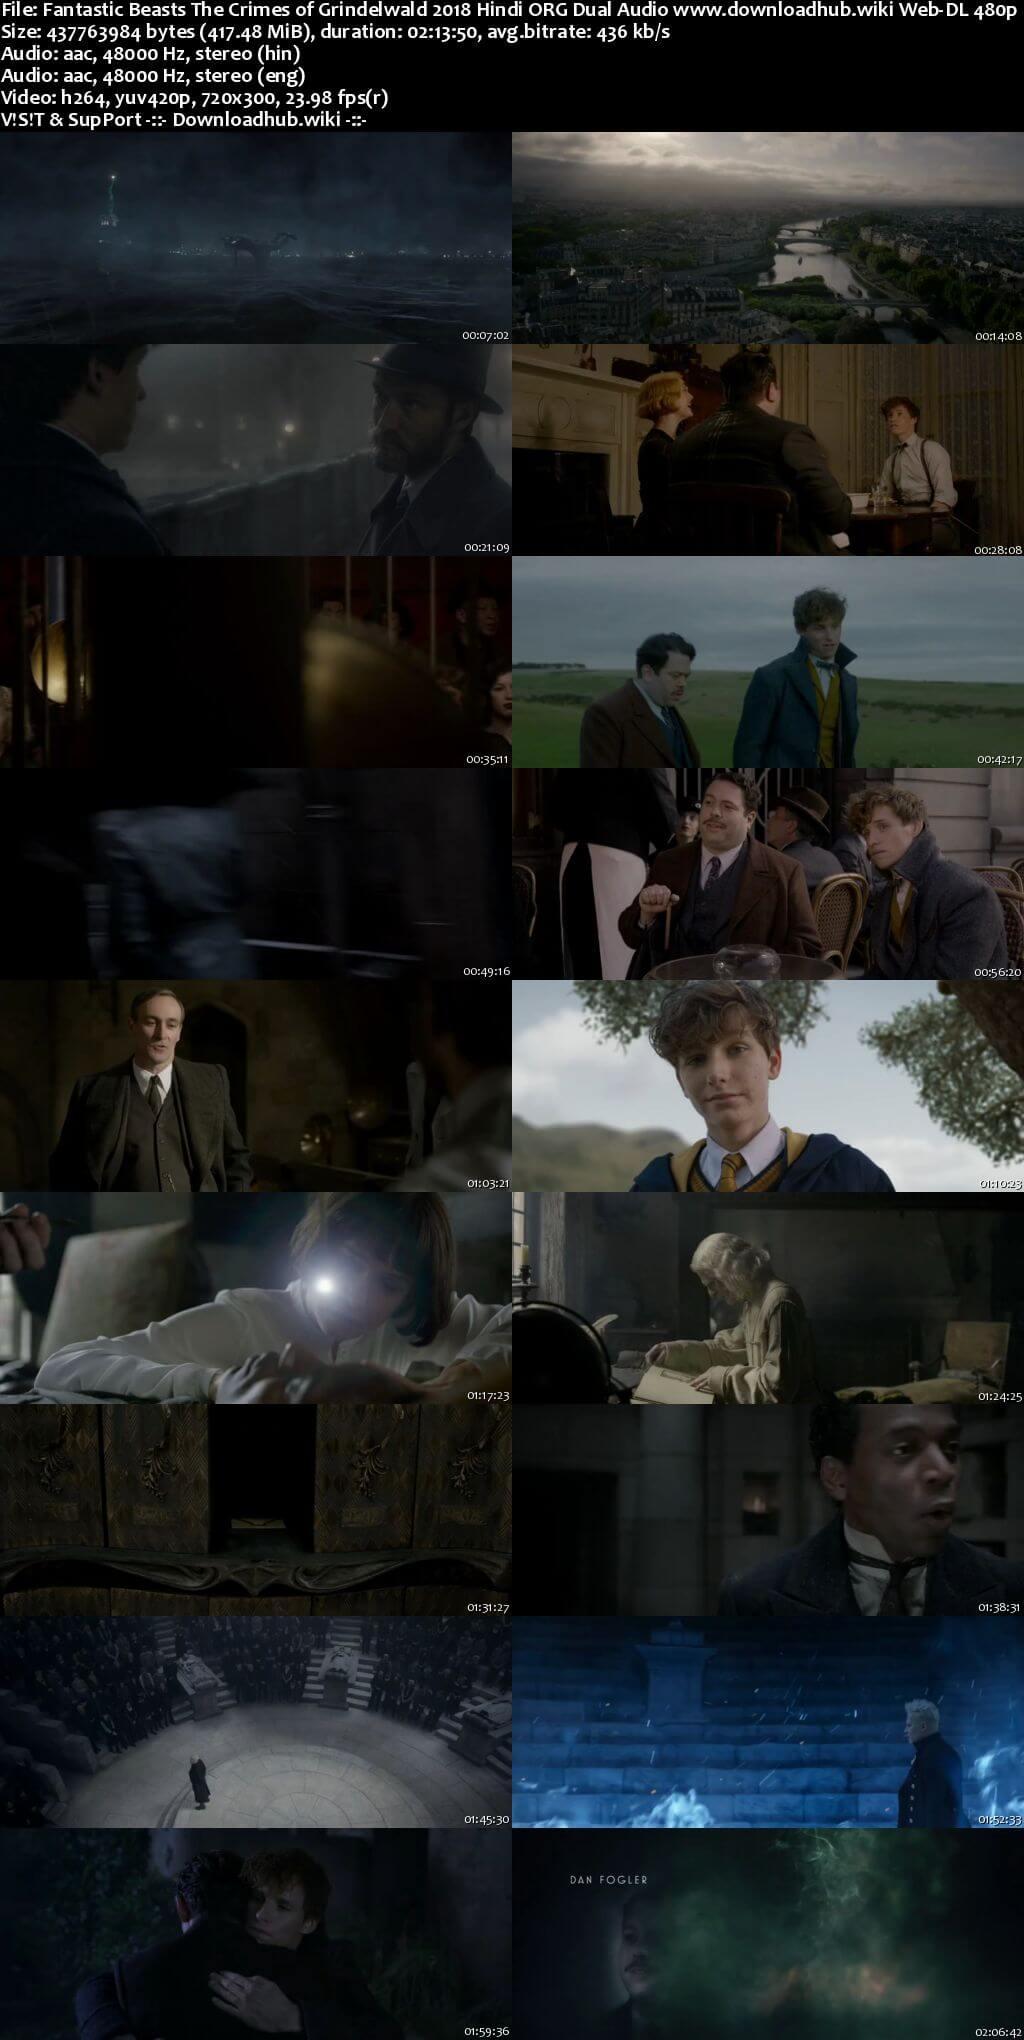 Fantastic Beasts The Crimes of Grindelwald 2018 Hindi ORG Dual Audio 400MB Web-DL 480p ESubs